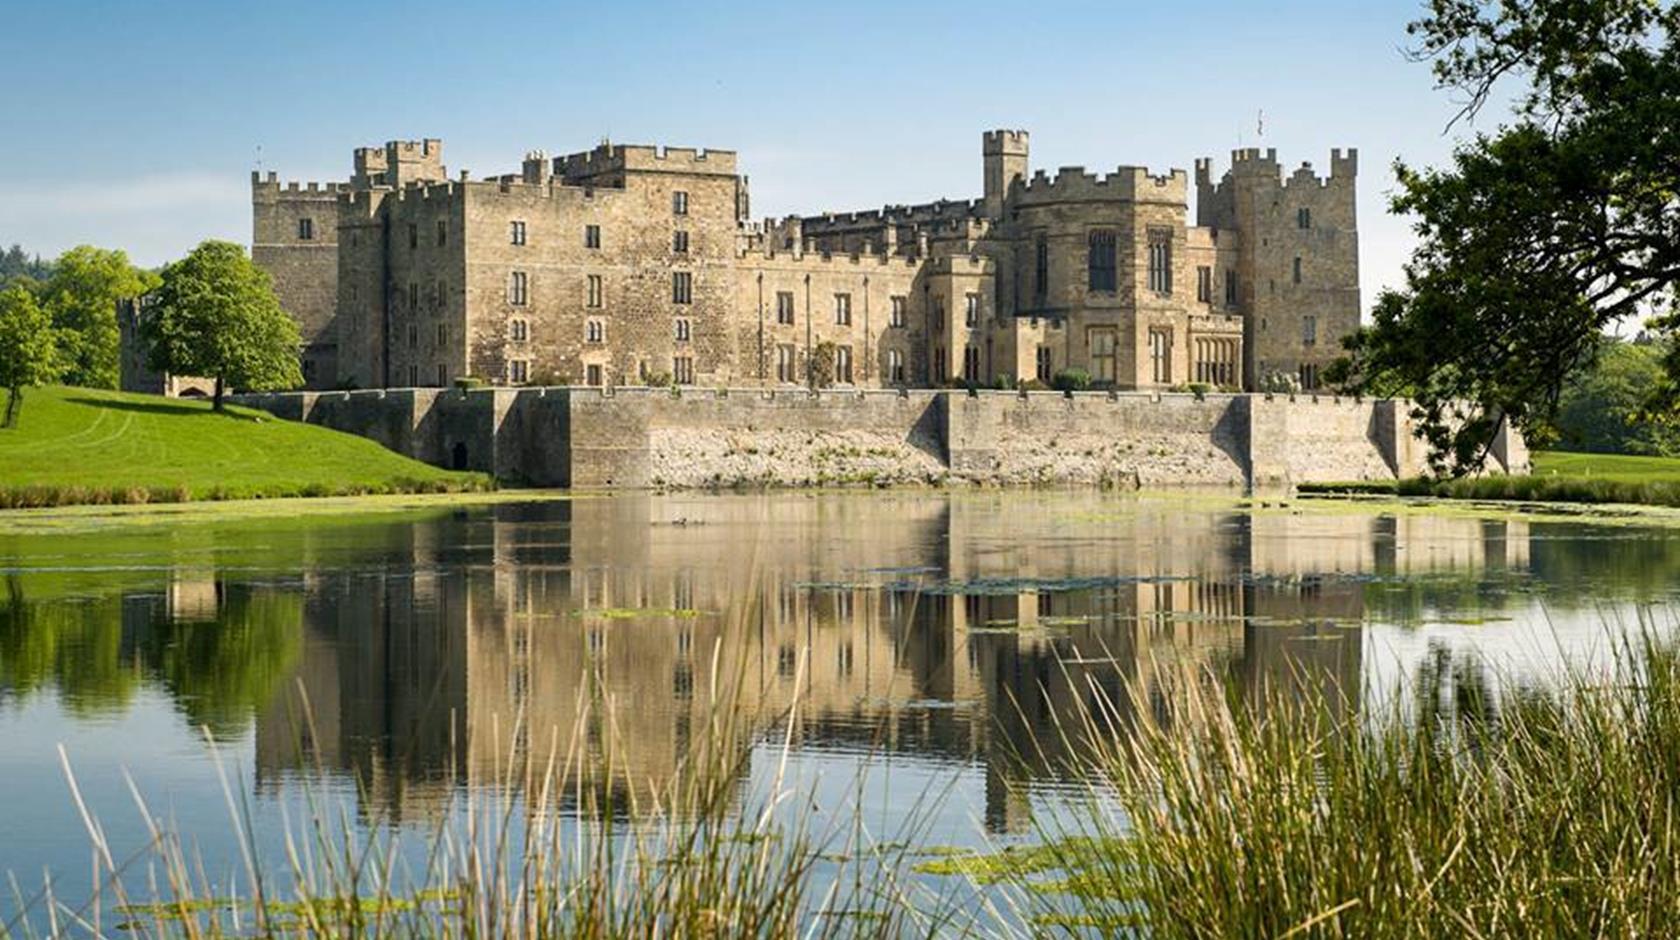 35722-raby-castle-darlington-01.jpg